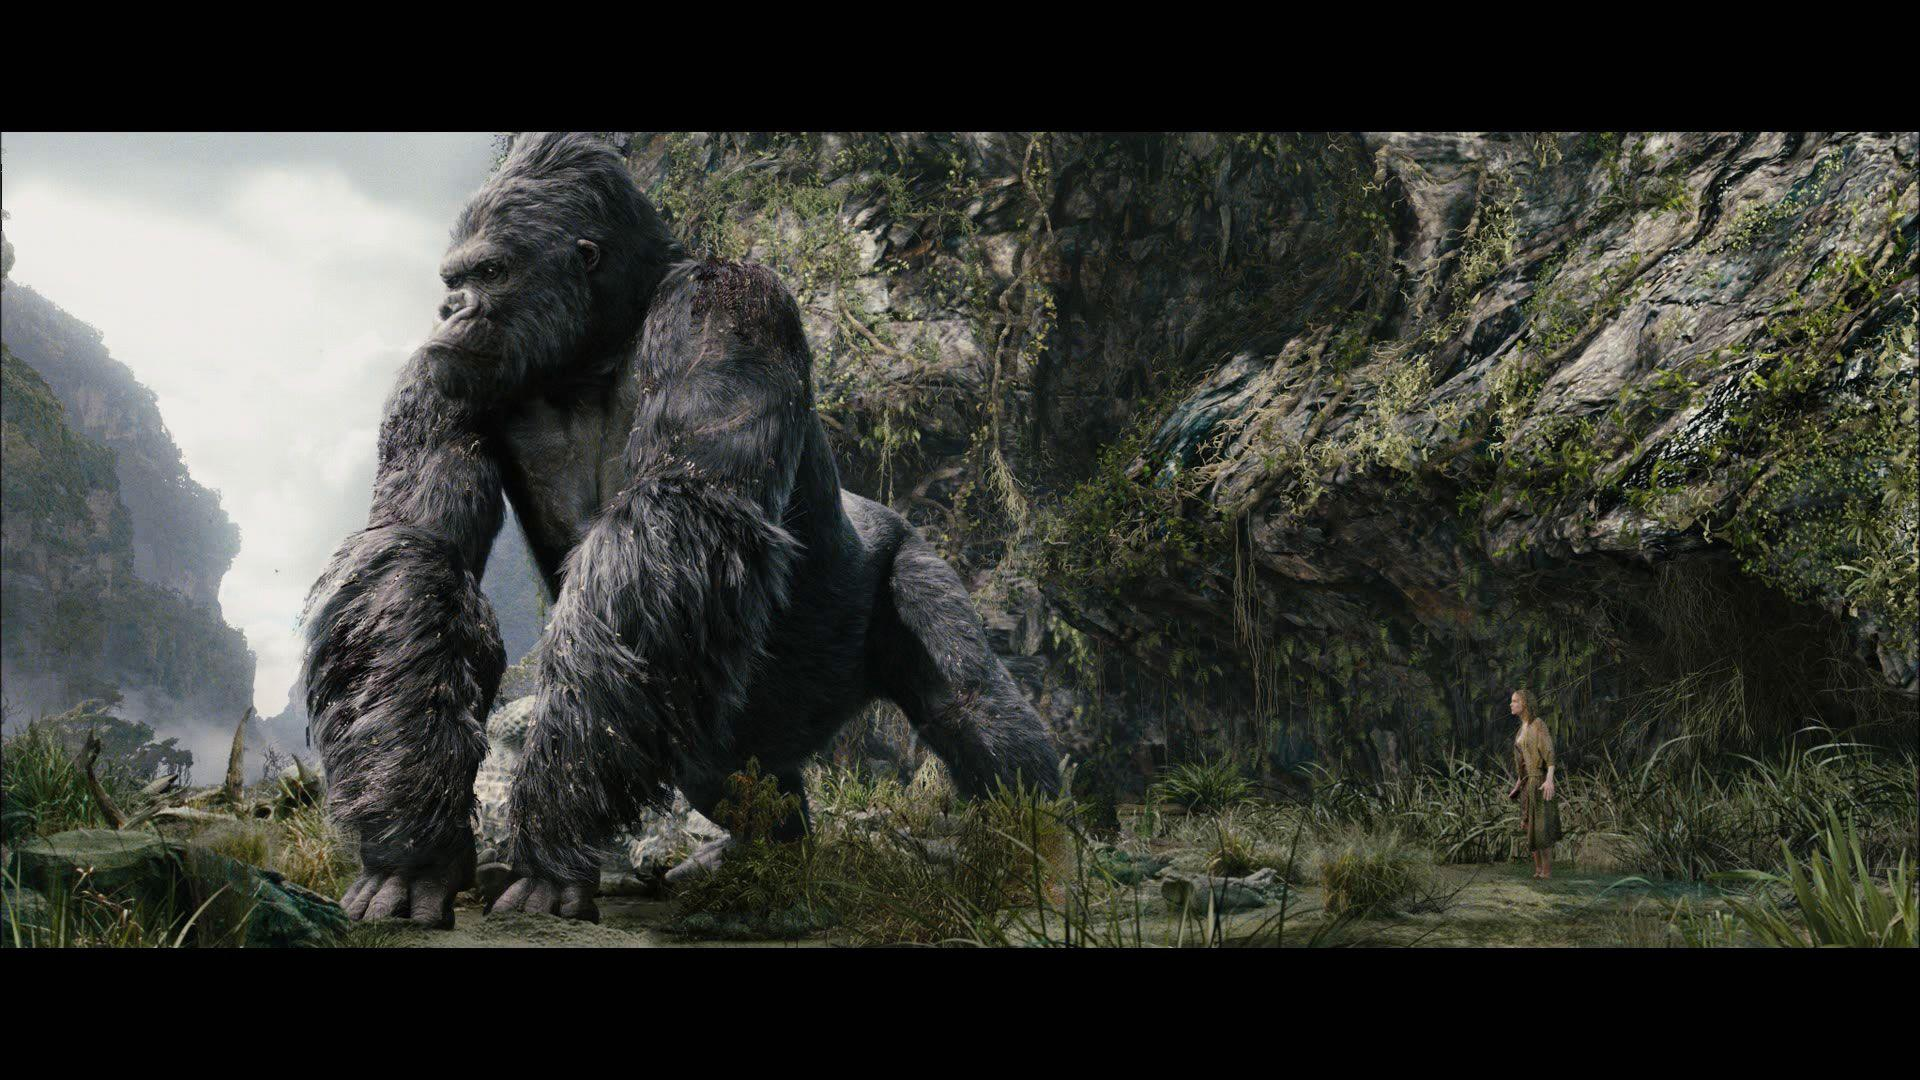 King Kong 2005 Full Movie Hd